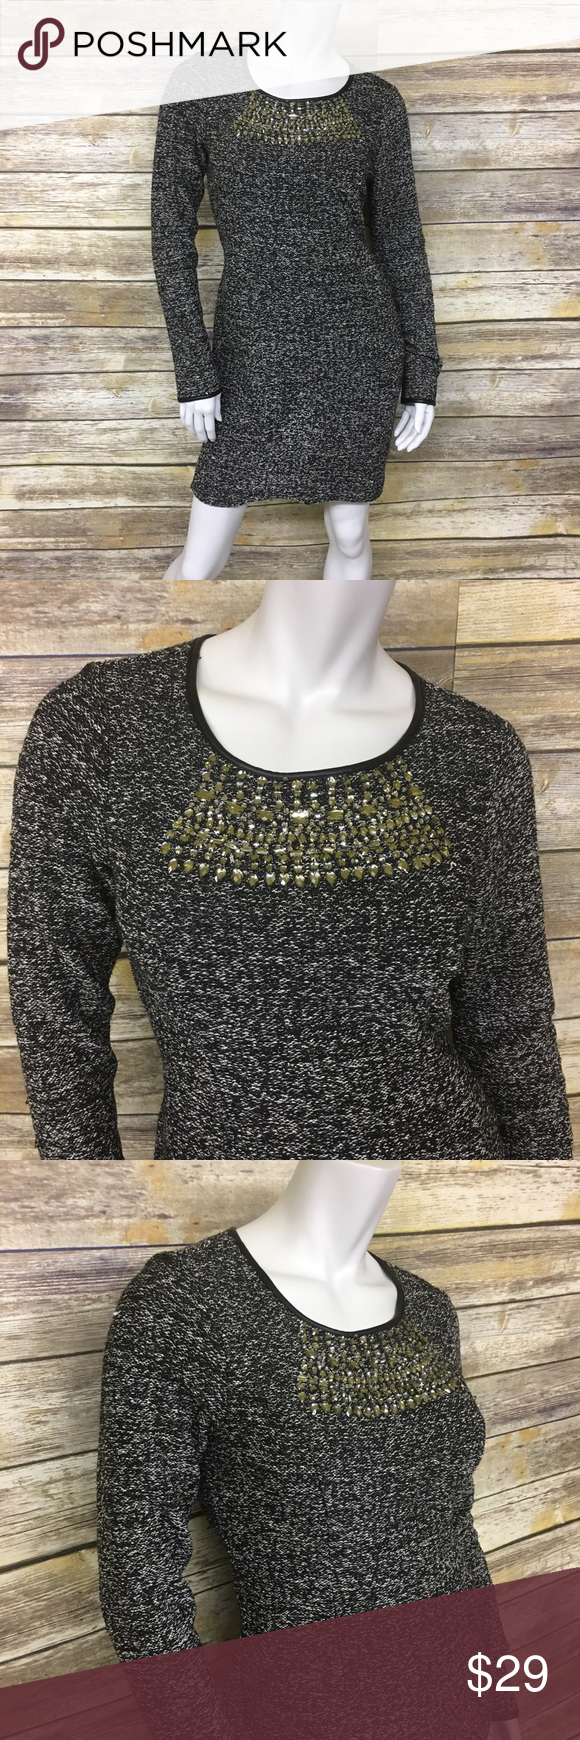 Rhinestone long sleeve sweater dress shoulder